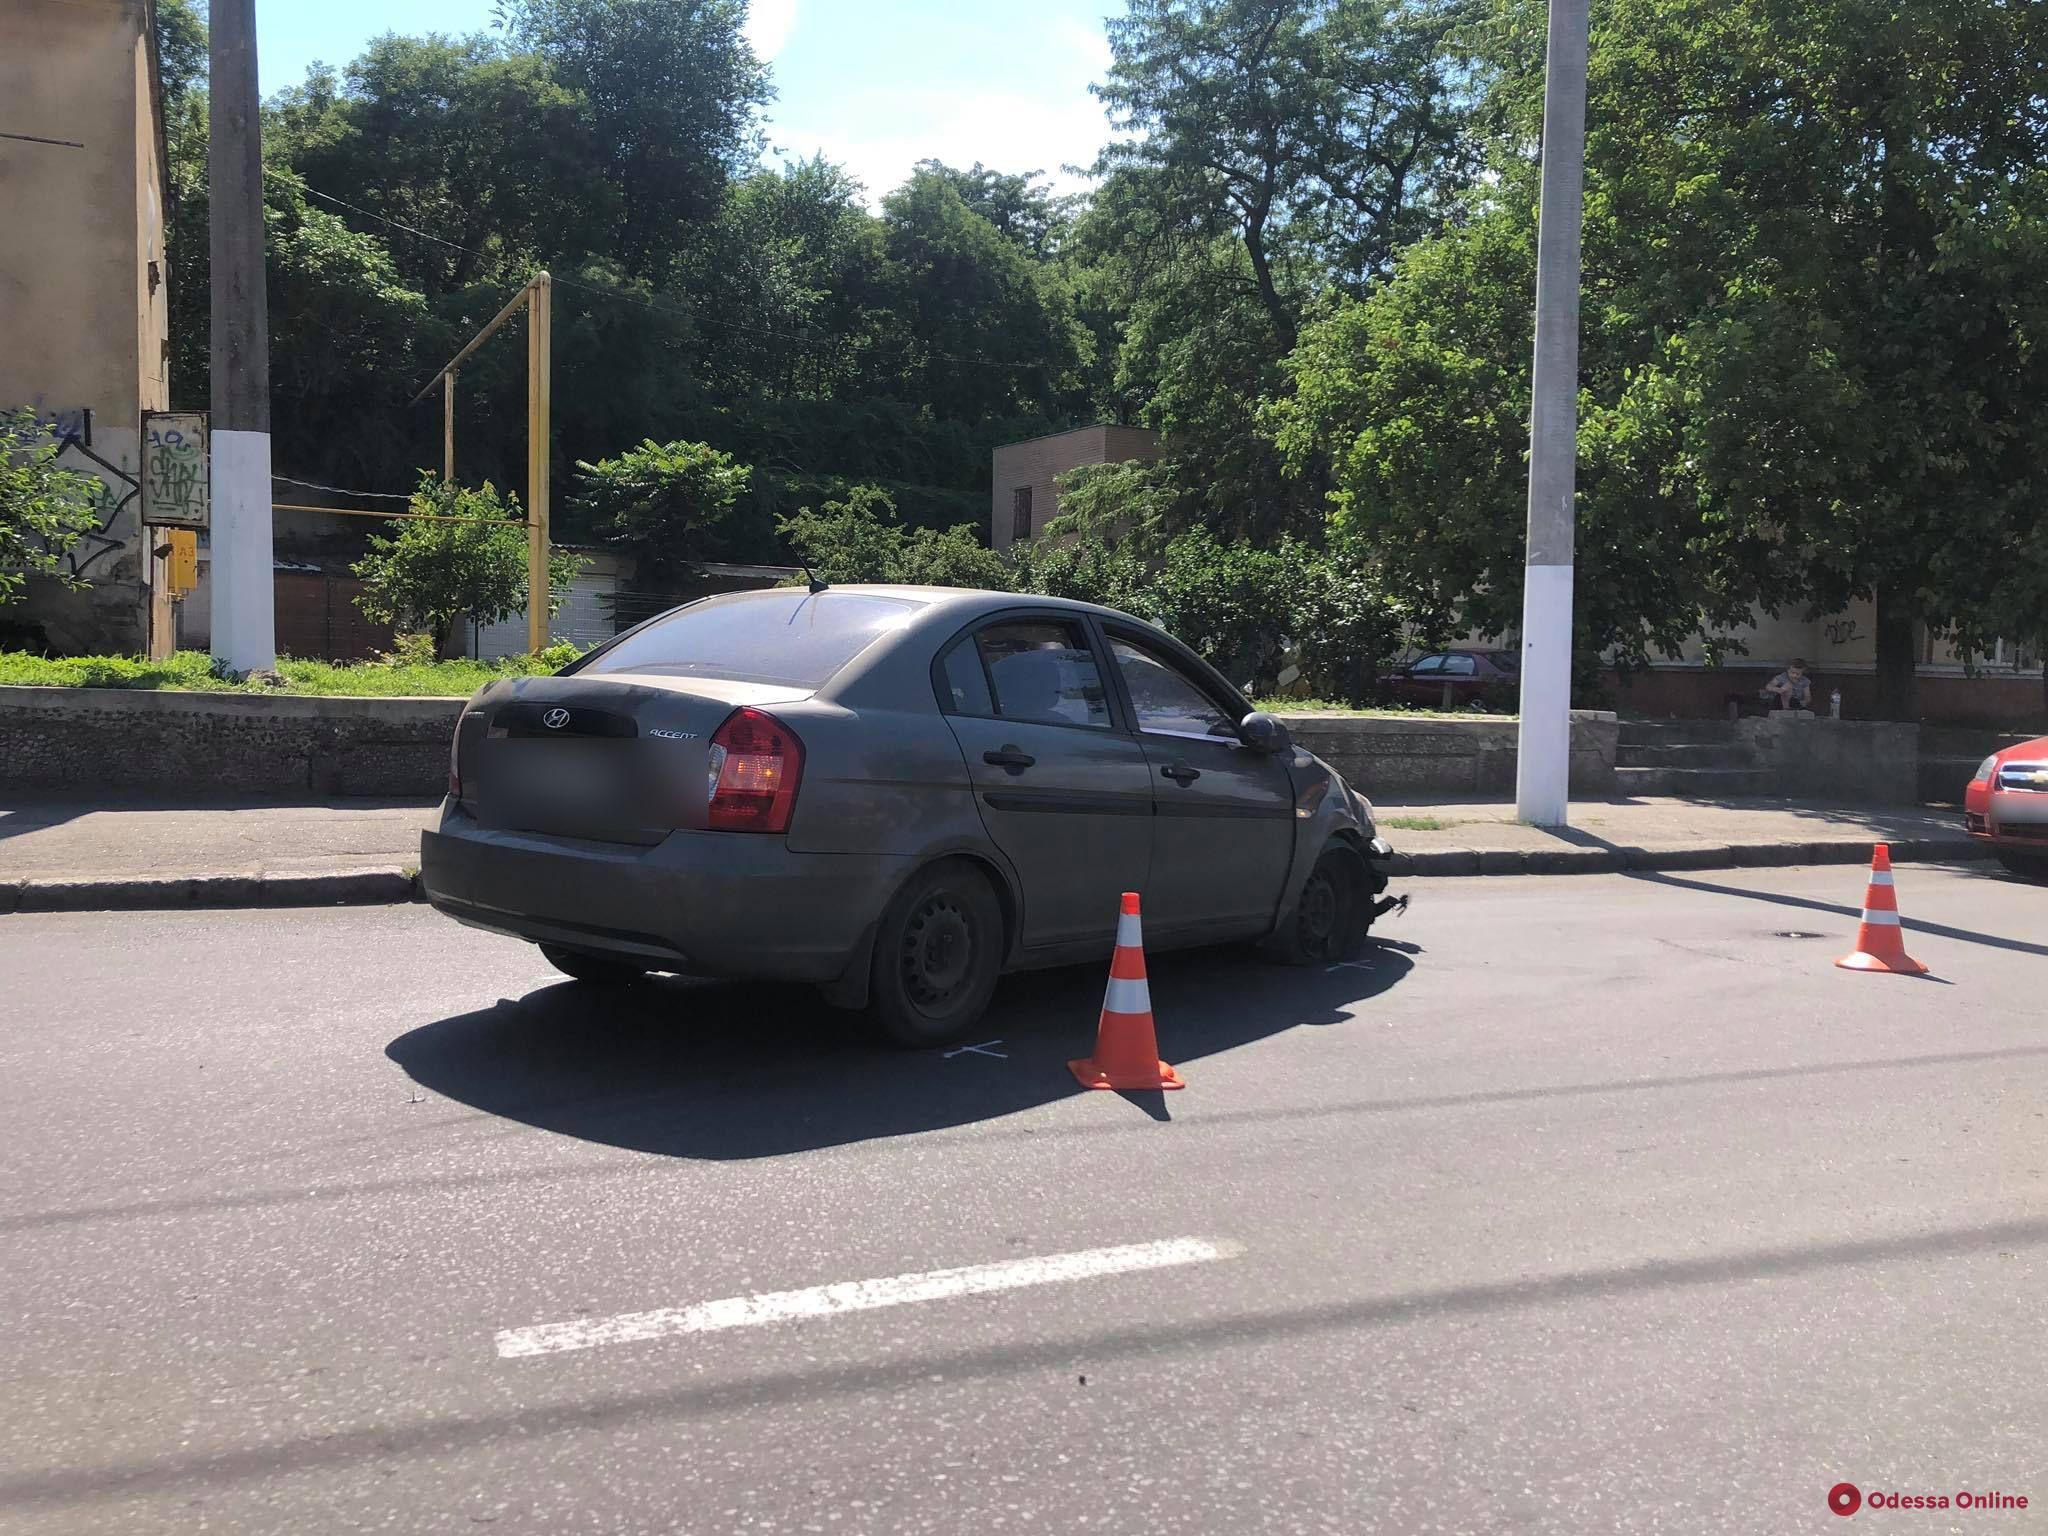 Возле морвокзала столкнулись Chevrolet и Hyundai